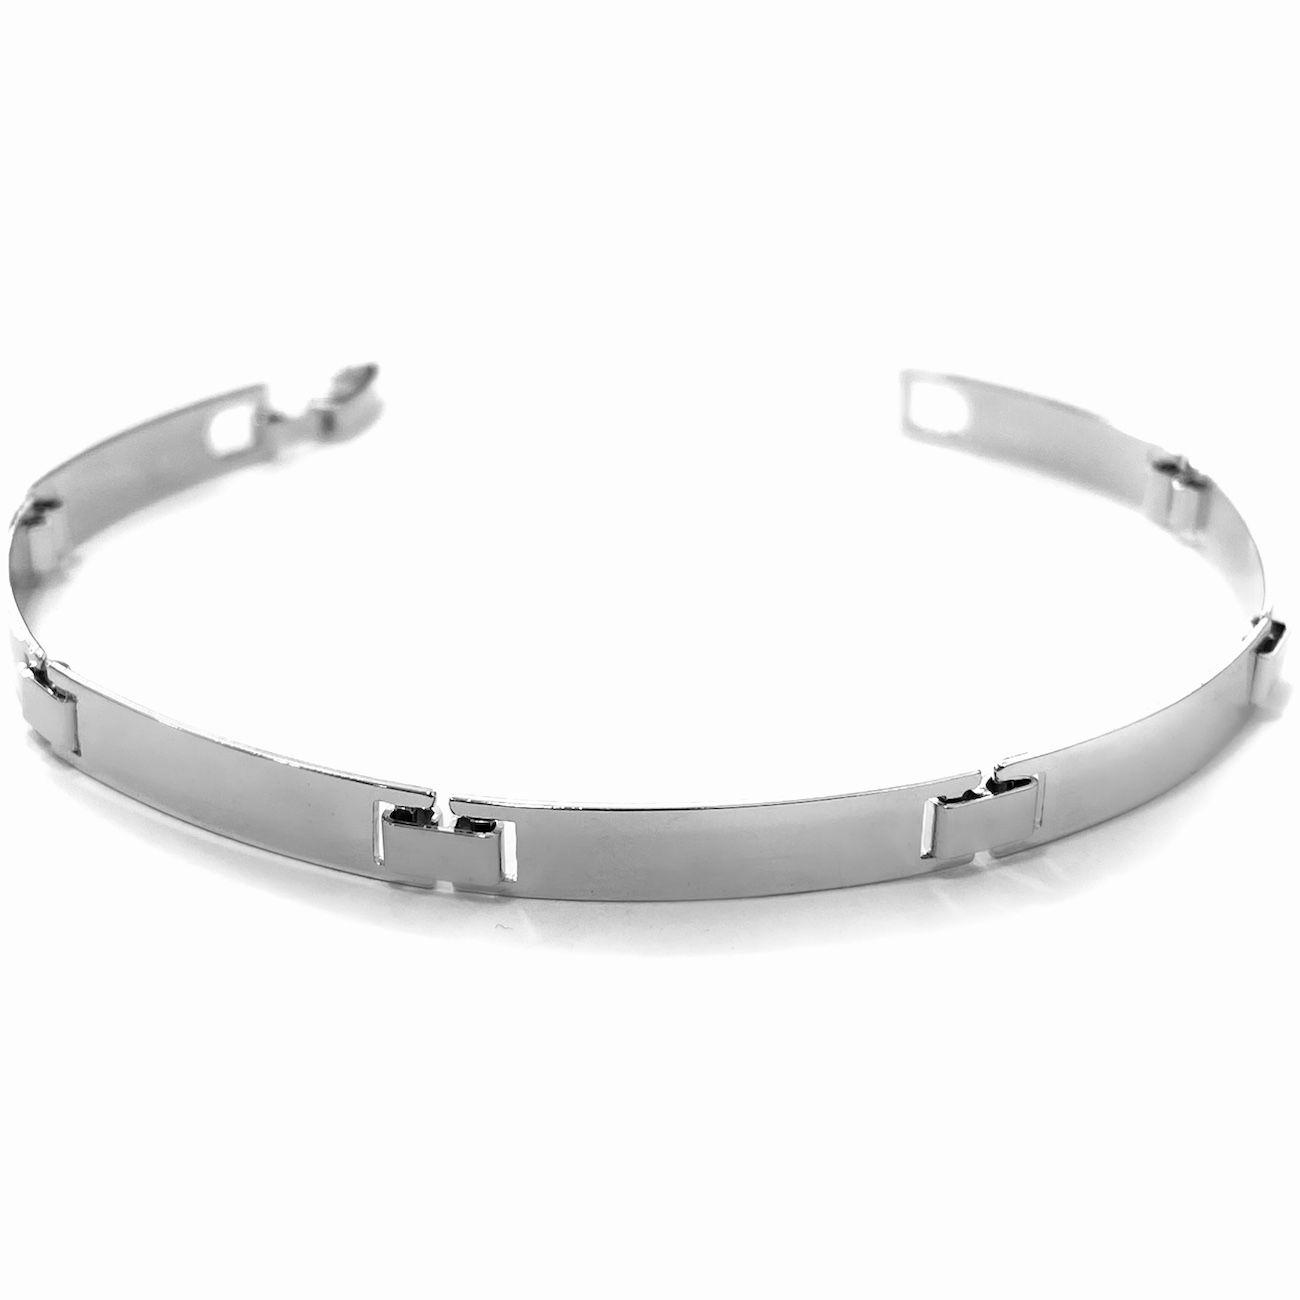 Bracelete Liso Prateado 5mm 6g (Banho Prata 925)